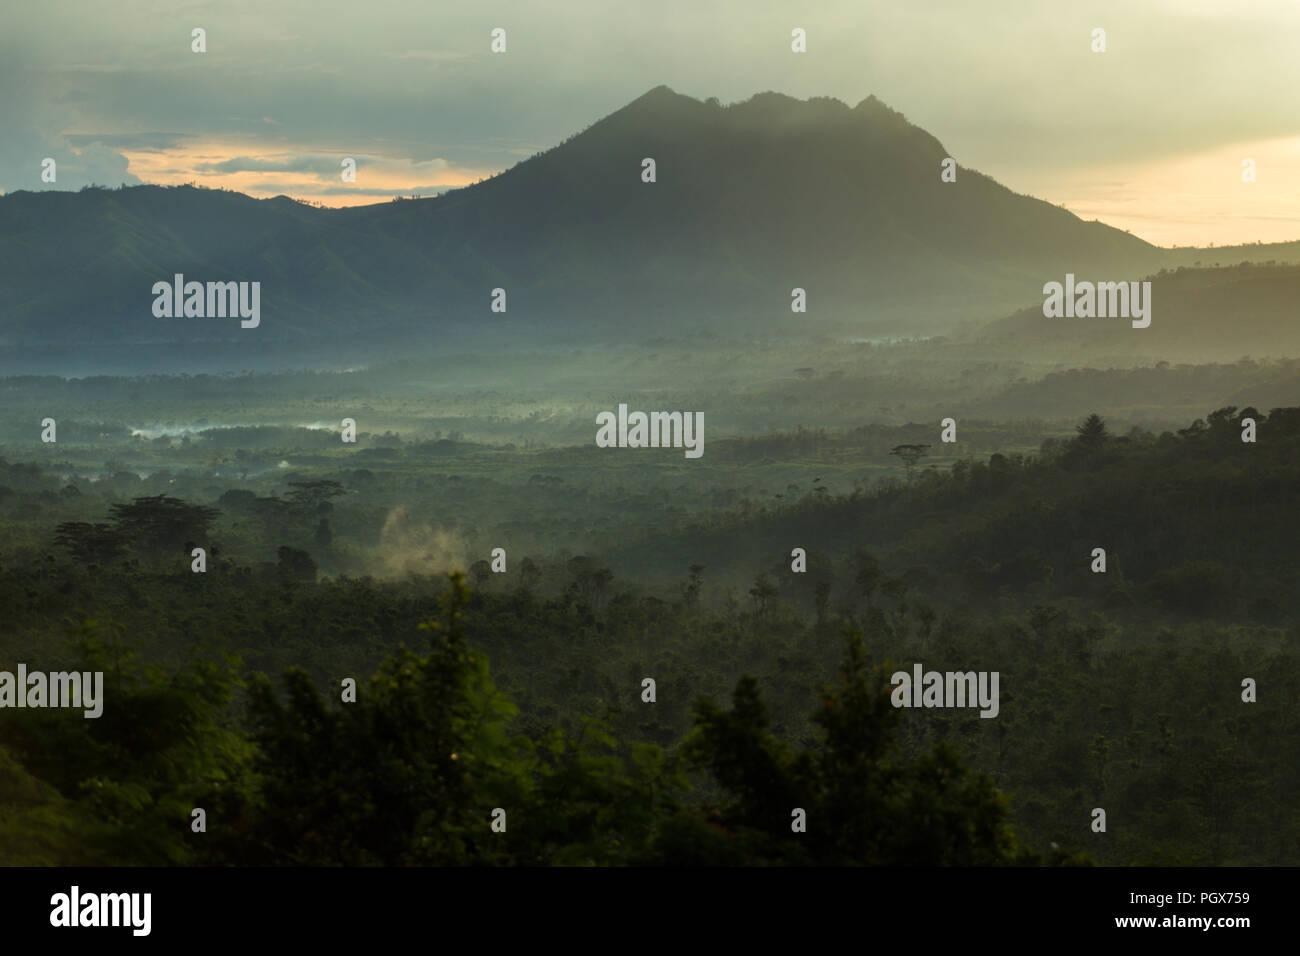 Ijen volcanoes, East Java, Indonesia - Stock Image